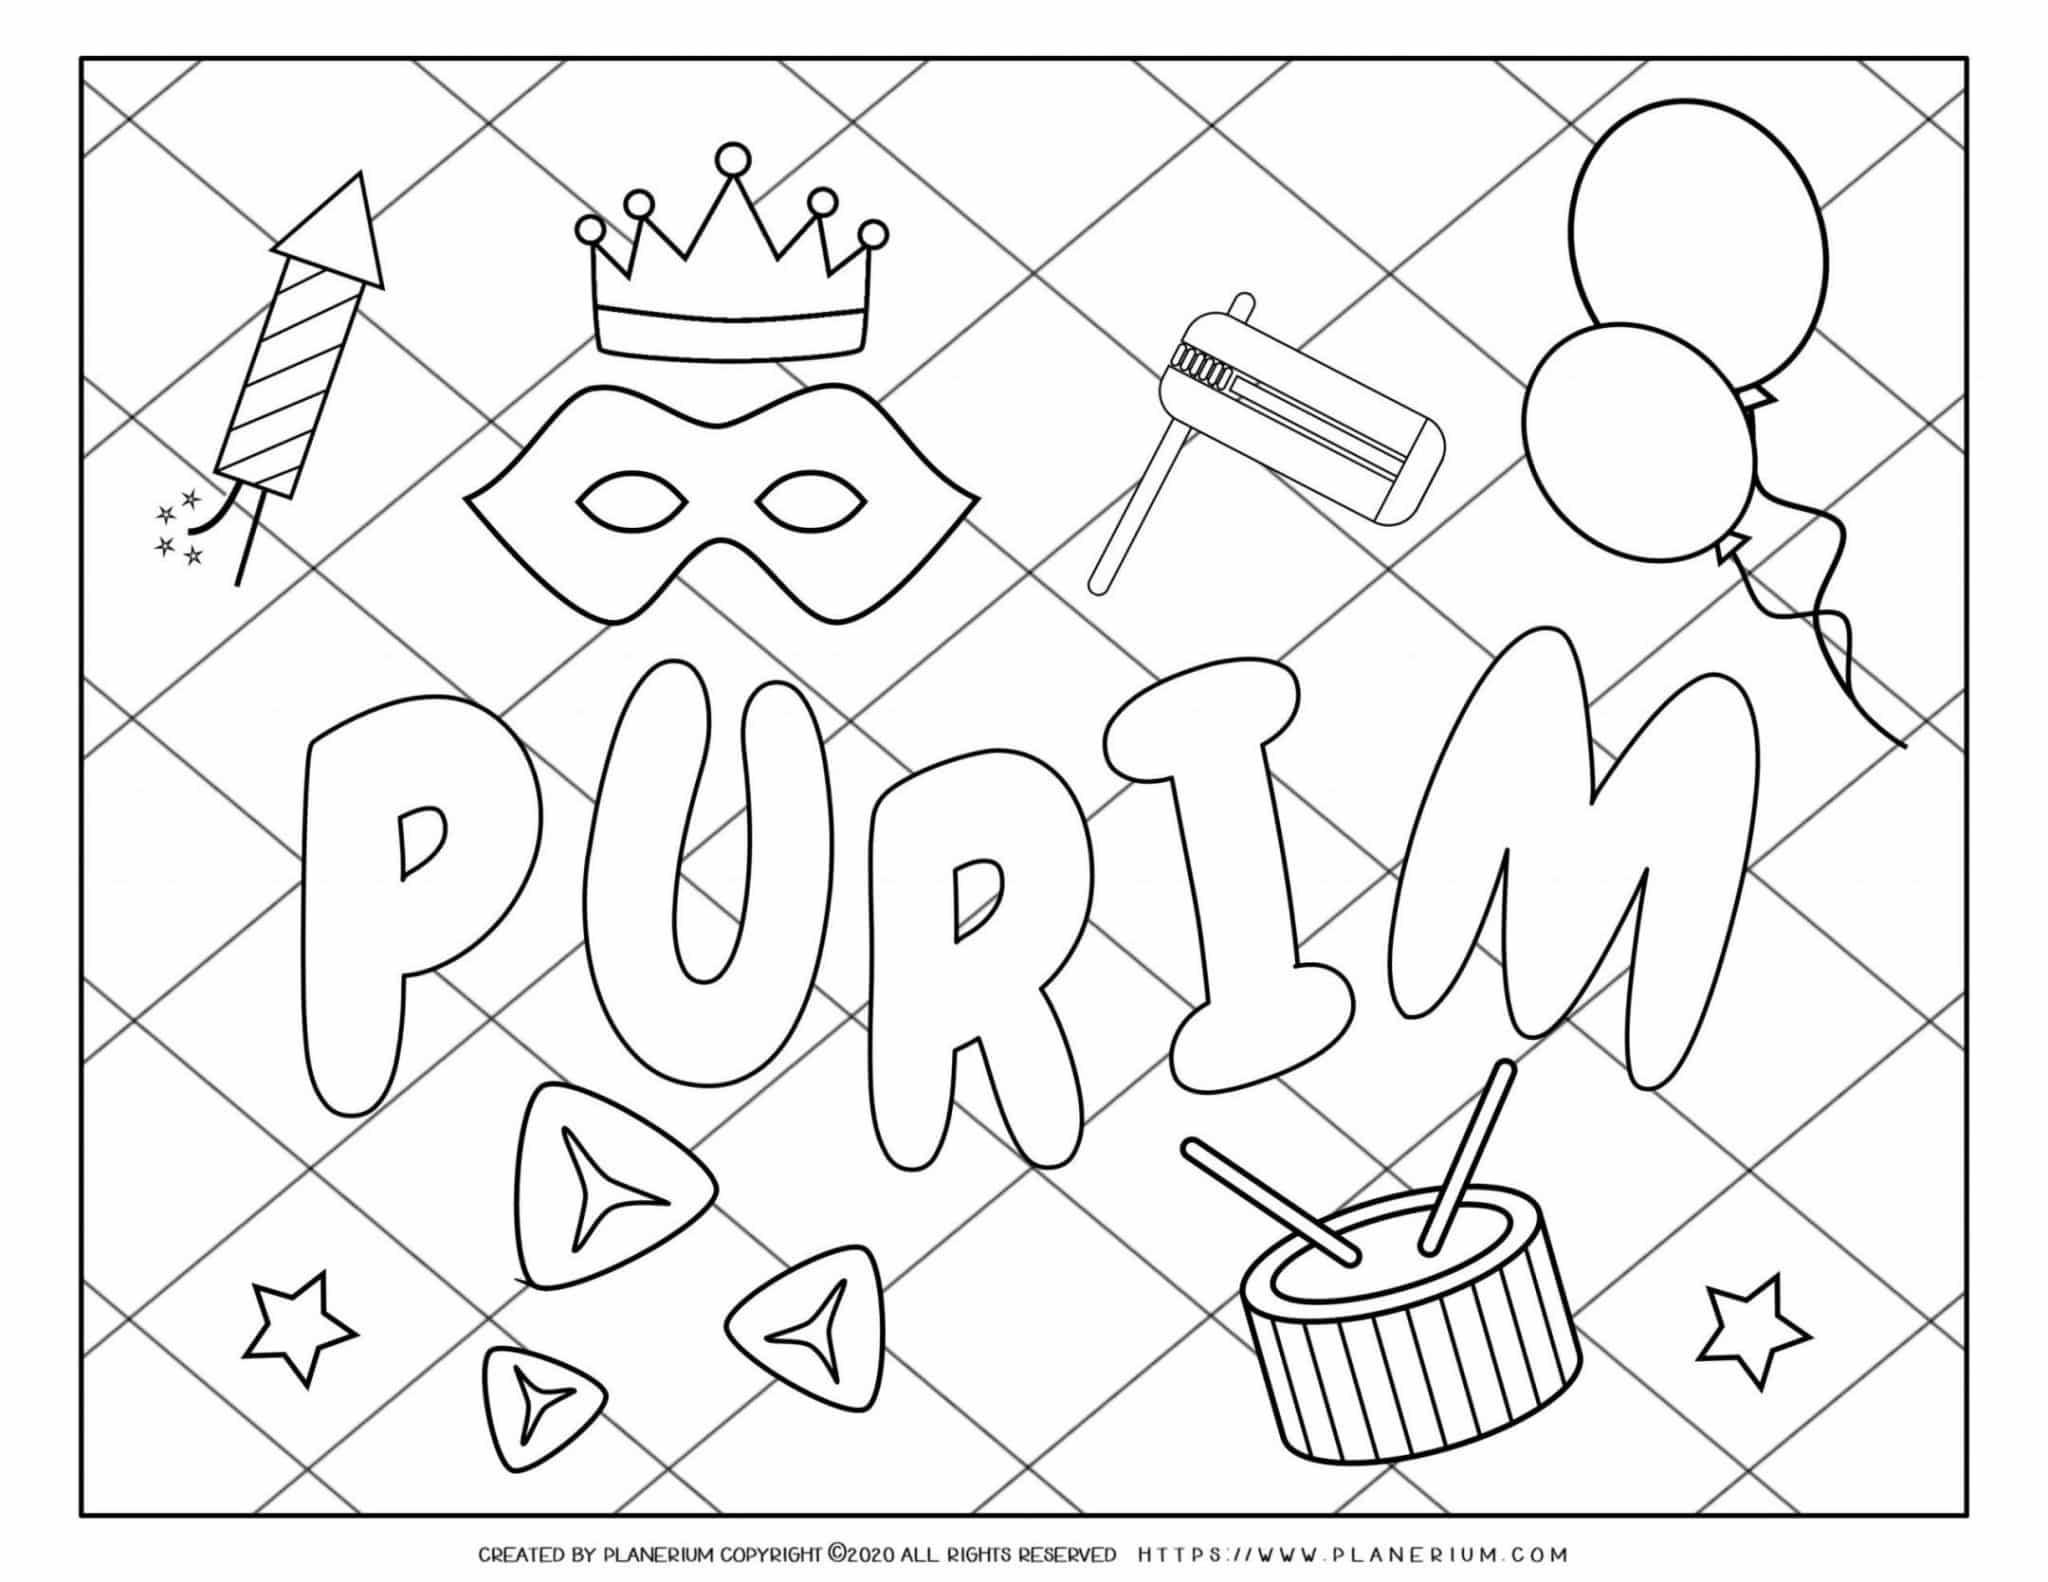 Purim Coloring Page Symbols Grid Background Planerium